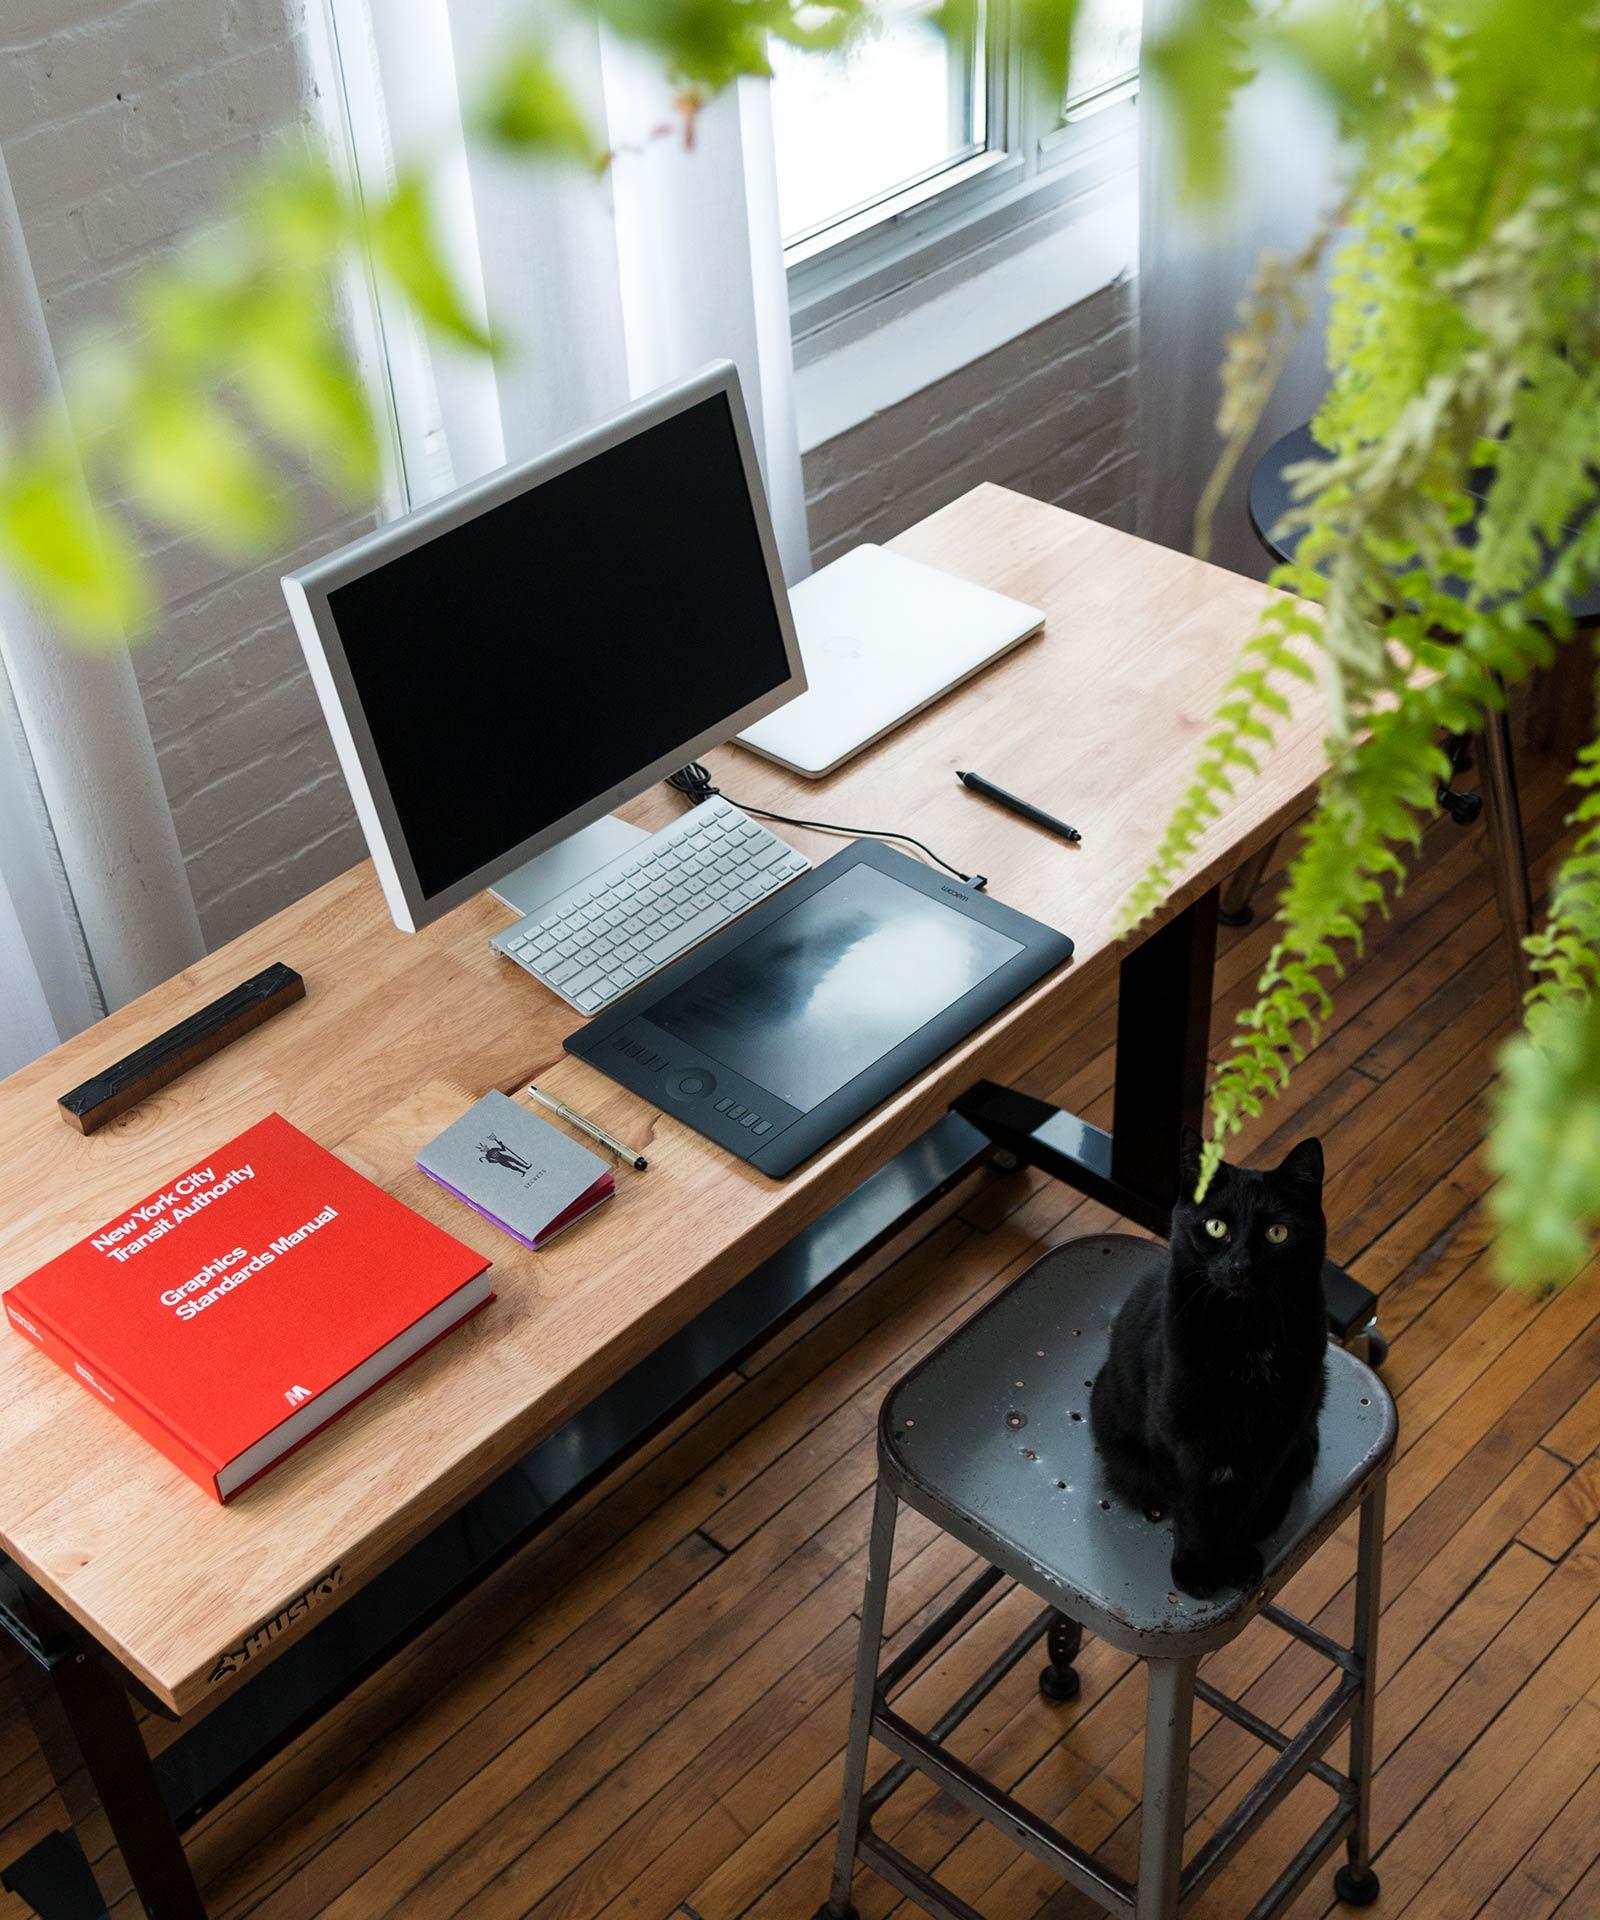 Graphic design workspace in loft studio